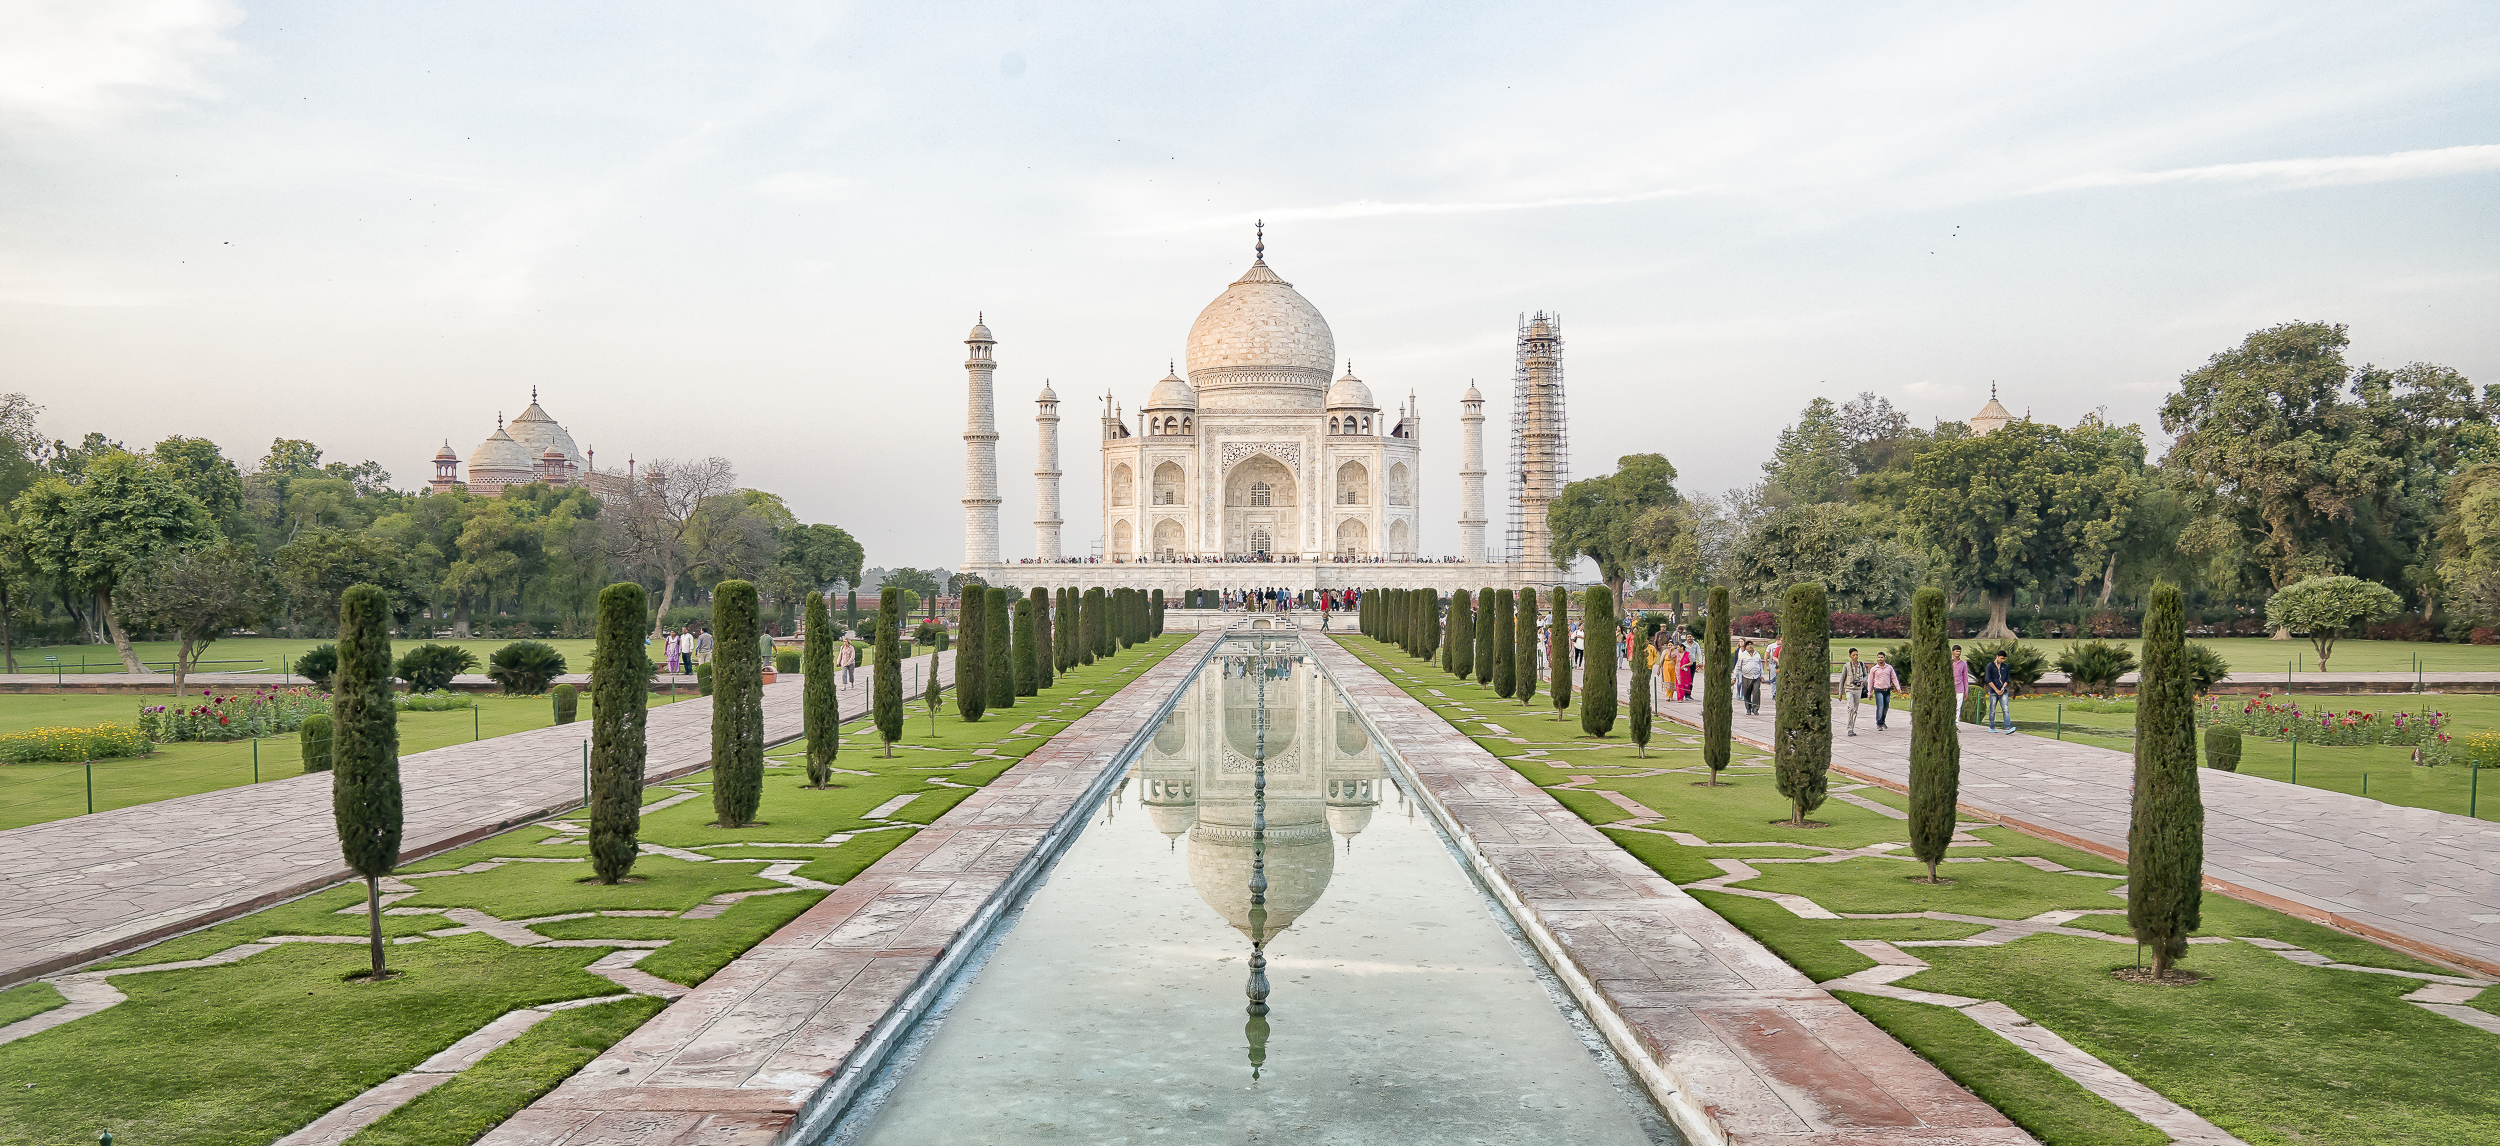 Taj Mahal at sunset